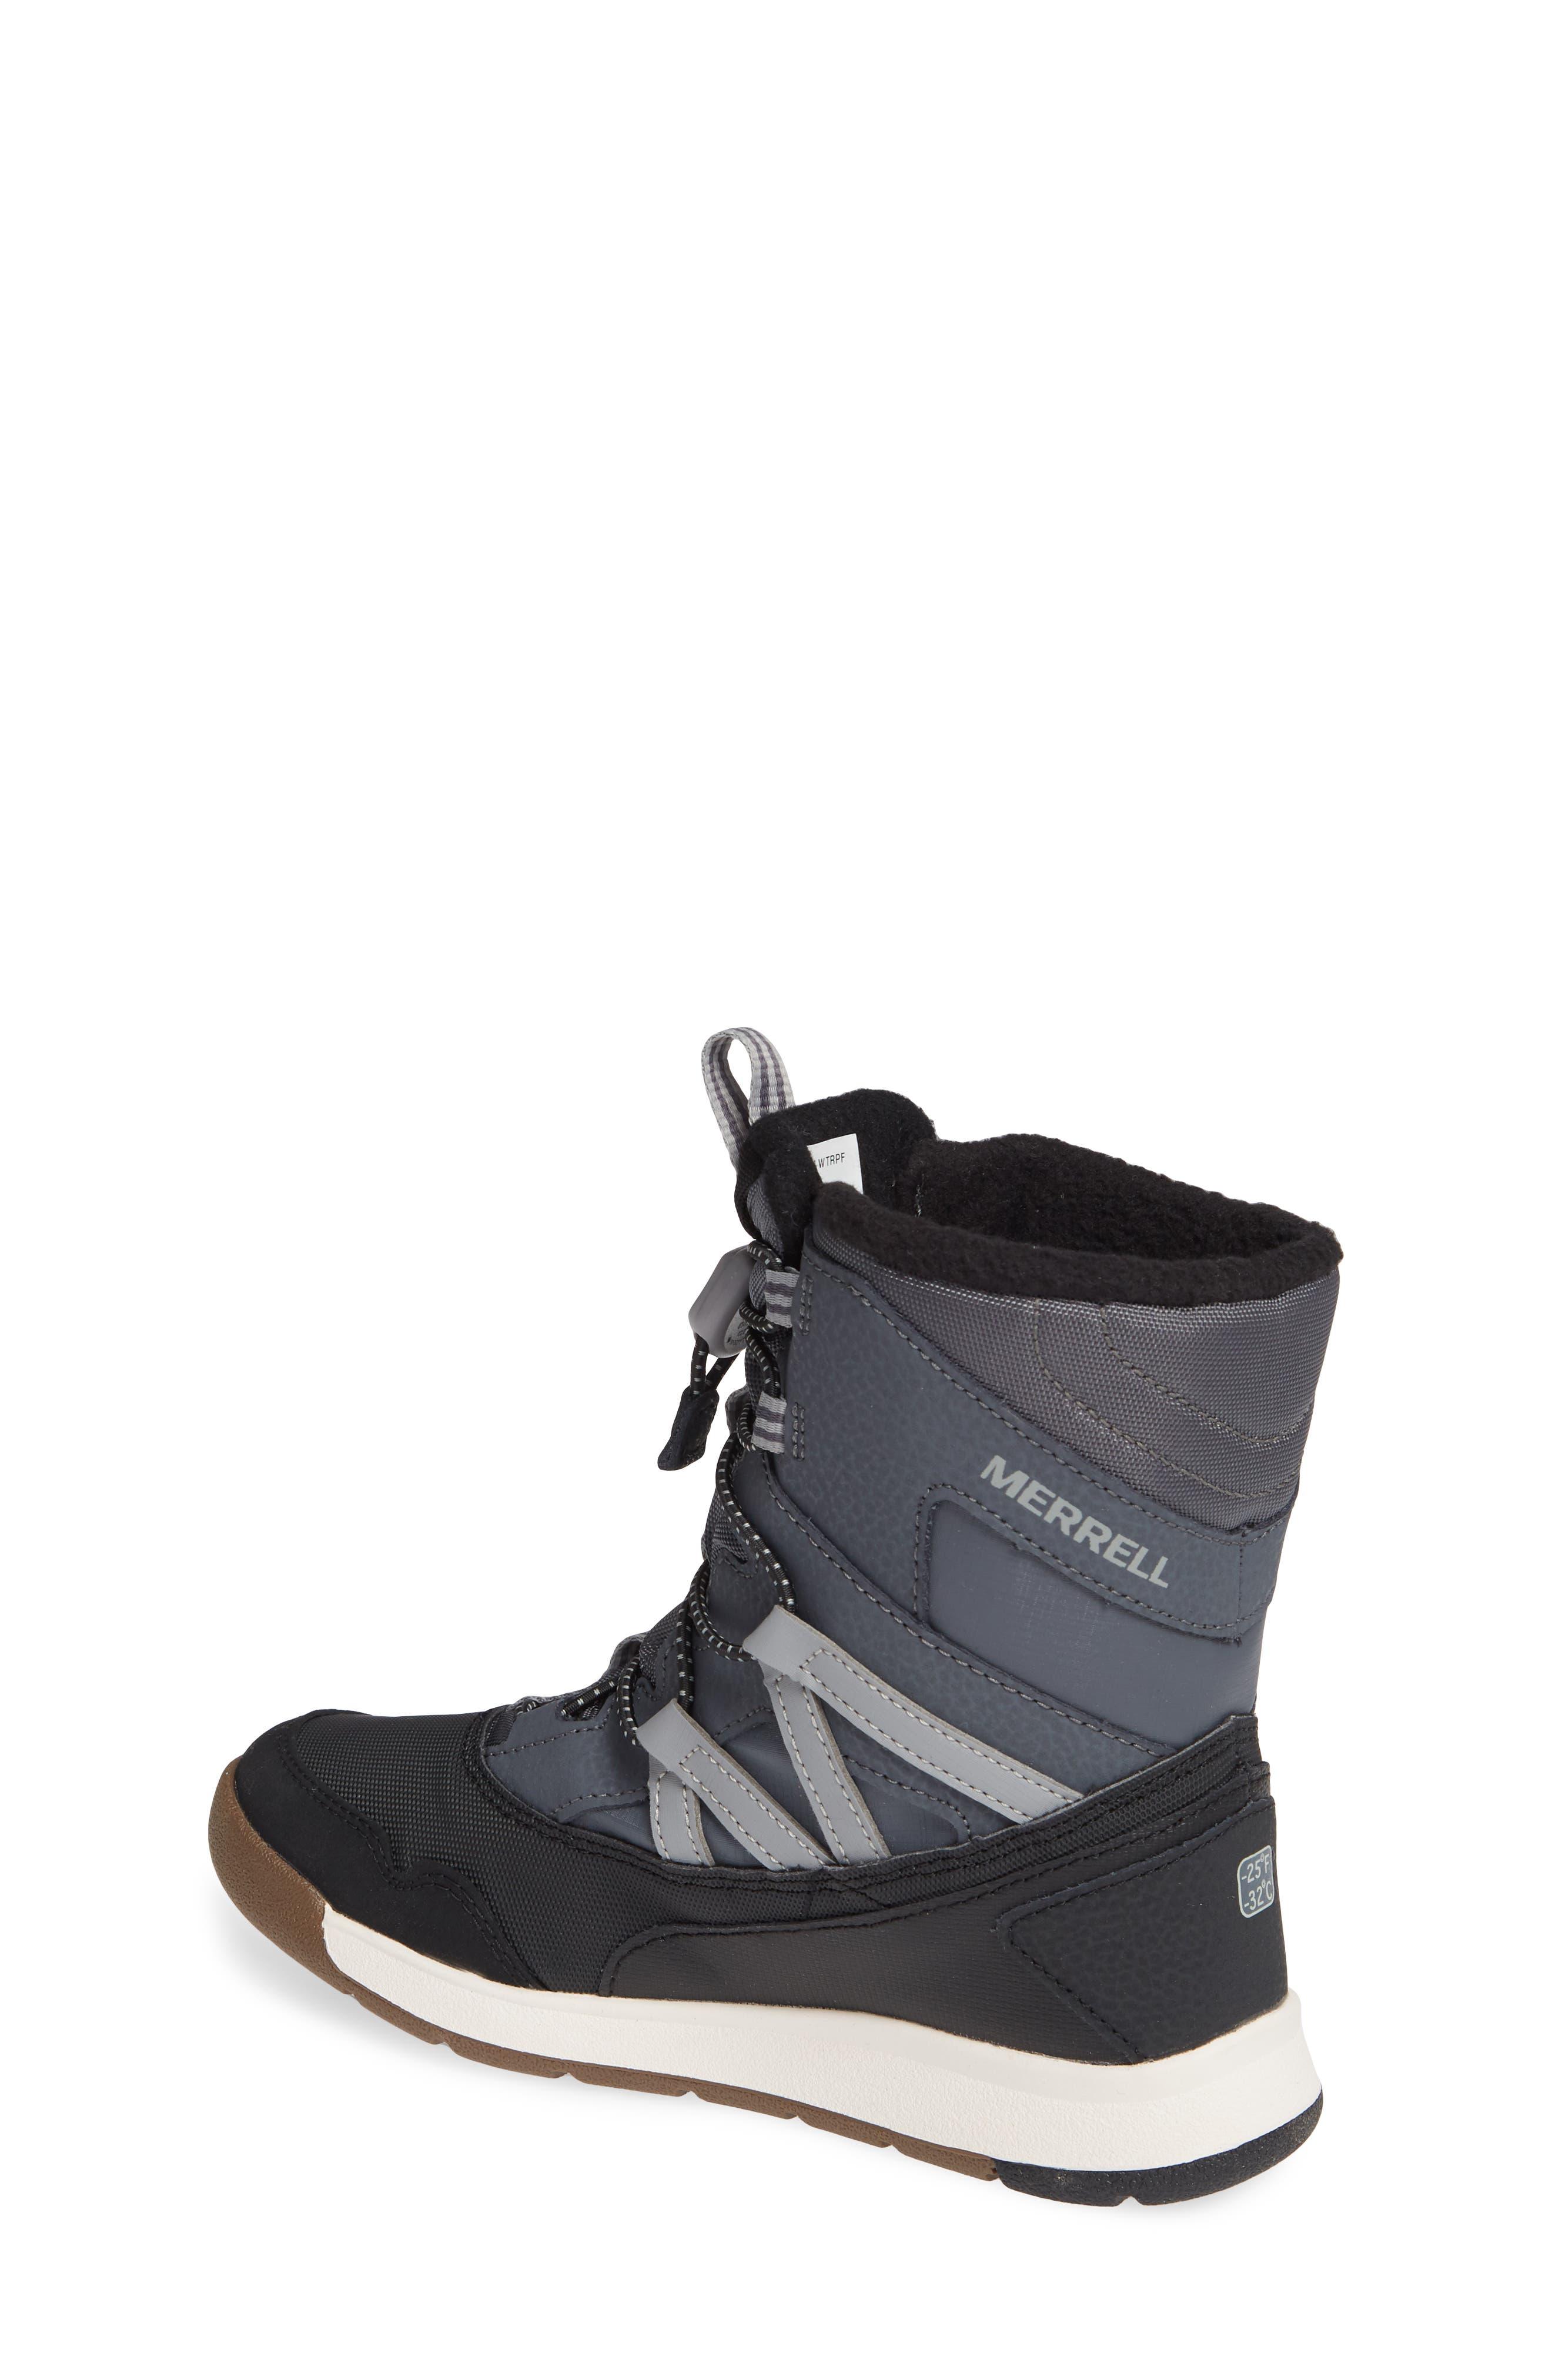 Snow Crush Waterproof Snow Boot,                             Alternate thumbnail 2, color,                             020